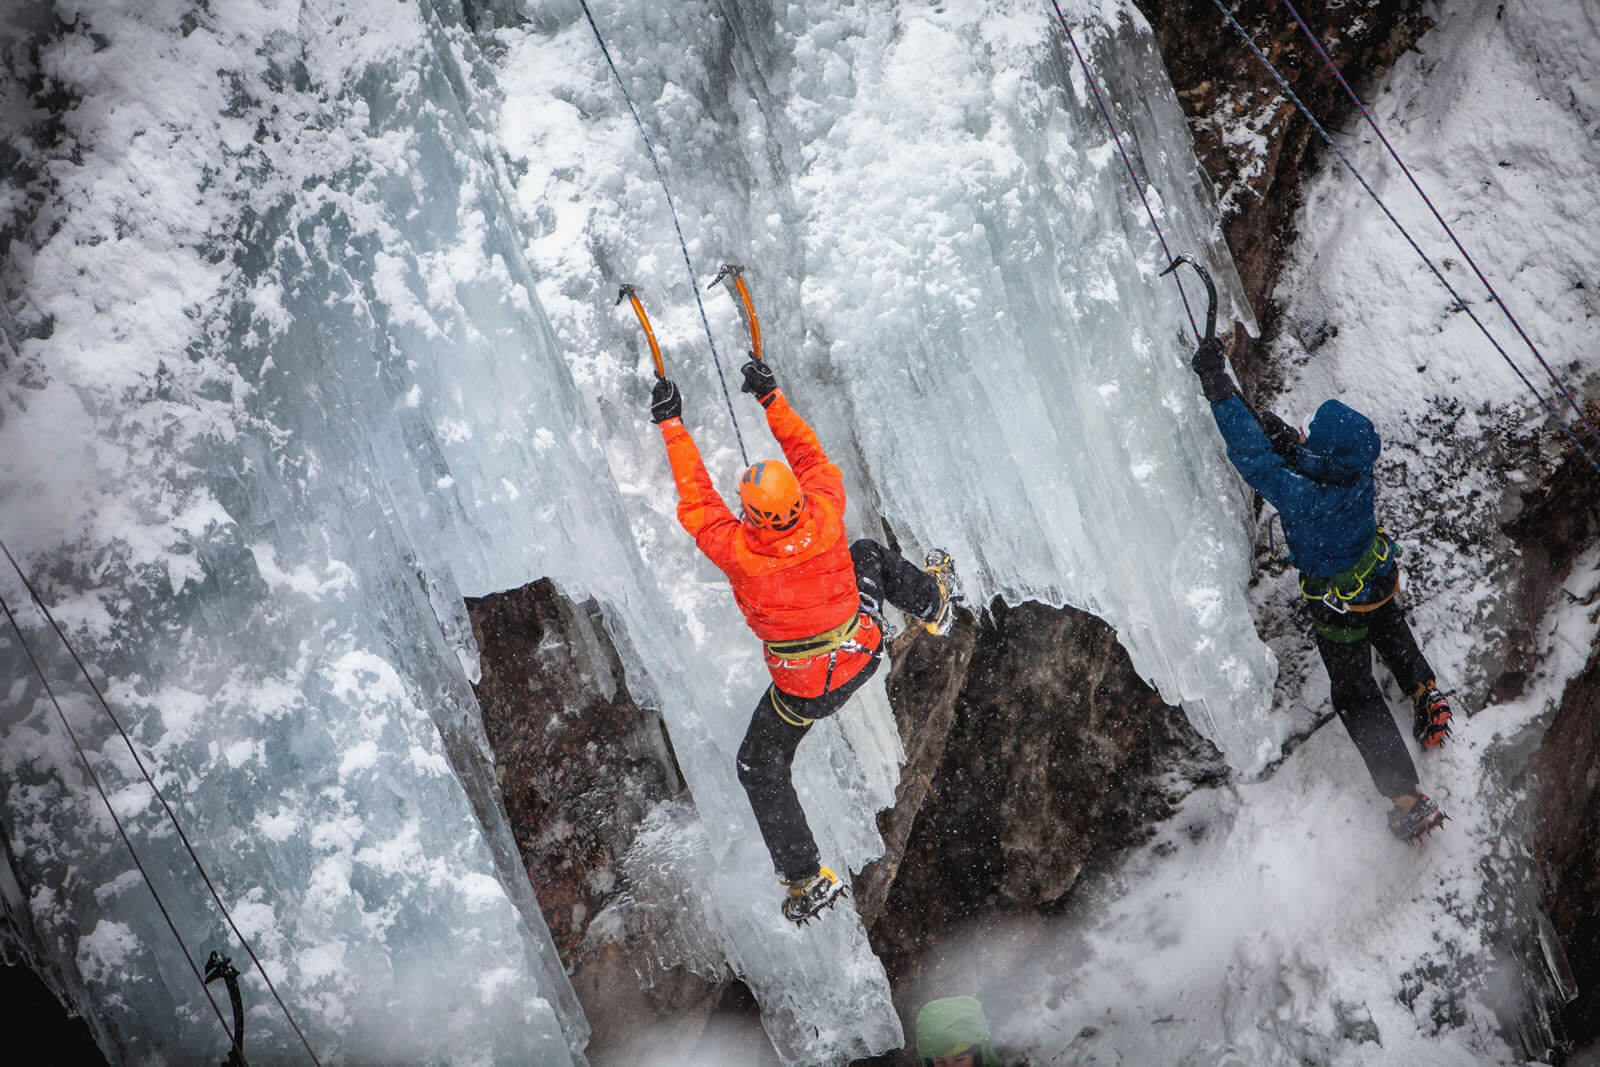 Eiskletterer am Pitztaler Gletscher